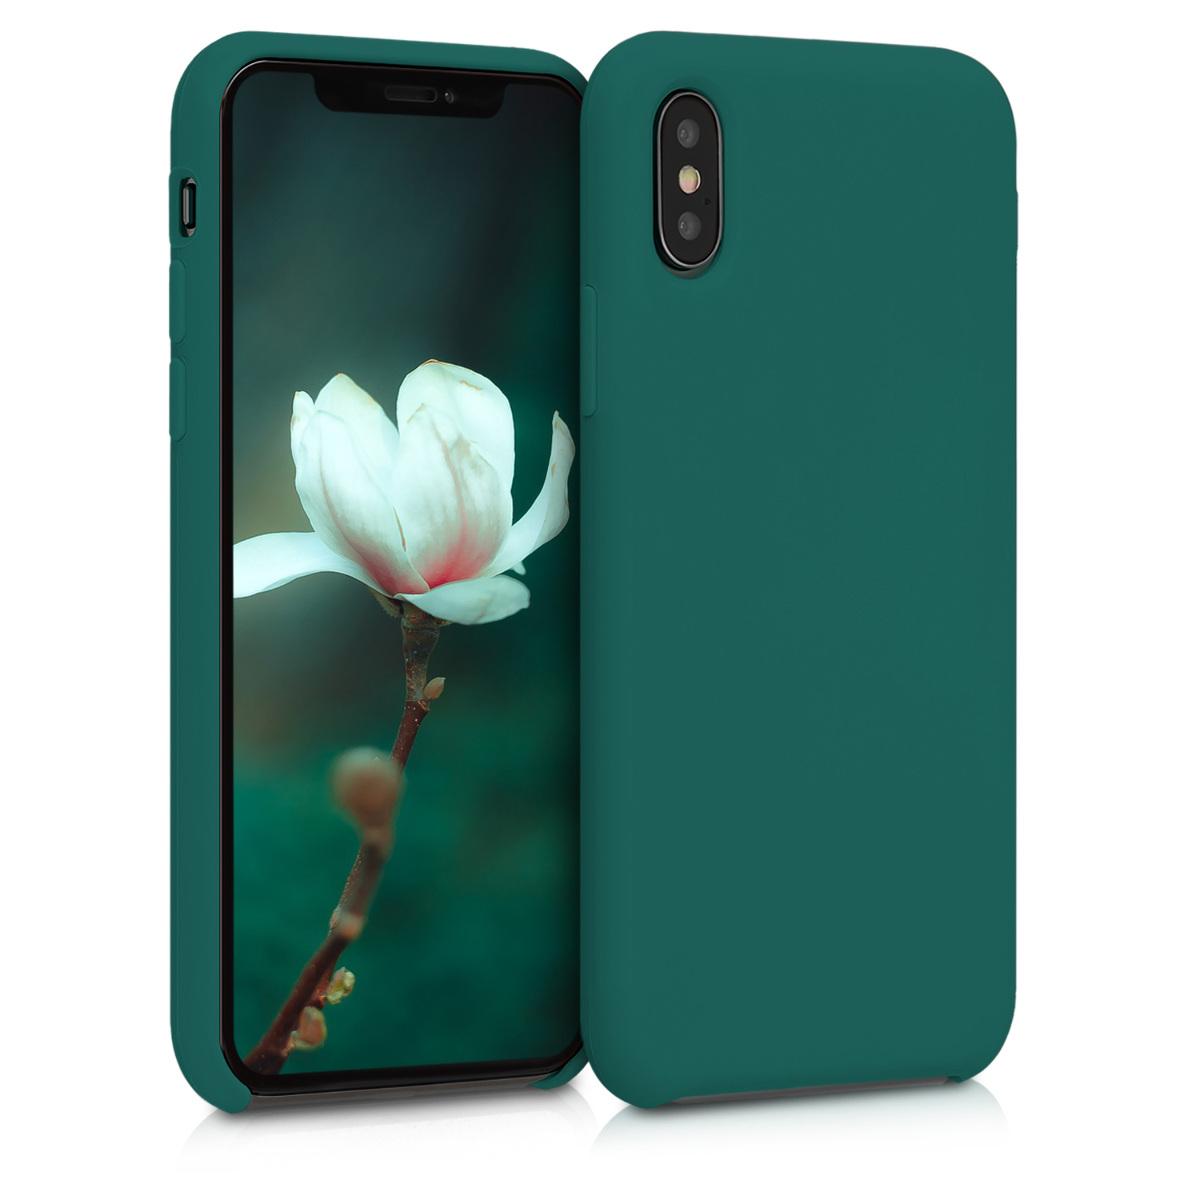 Kvalitní silikonové TPU pouzdro pro Apple iPhone XS - Turquoise Green